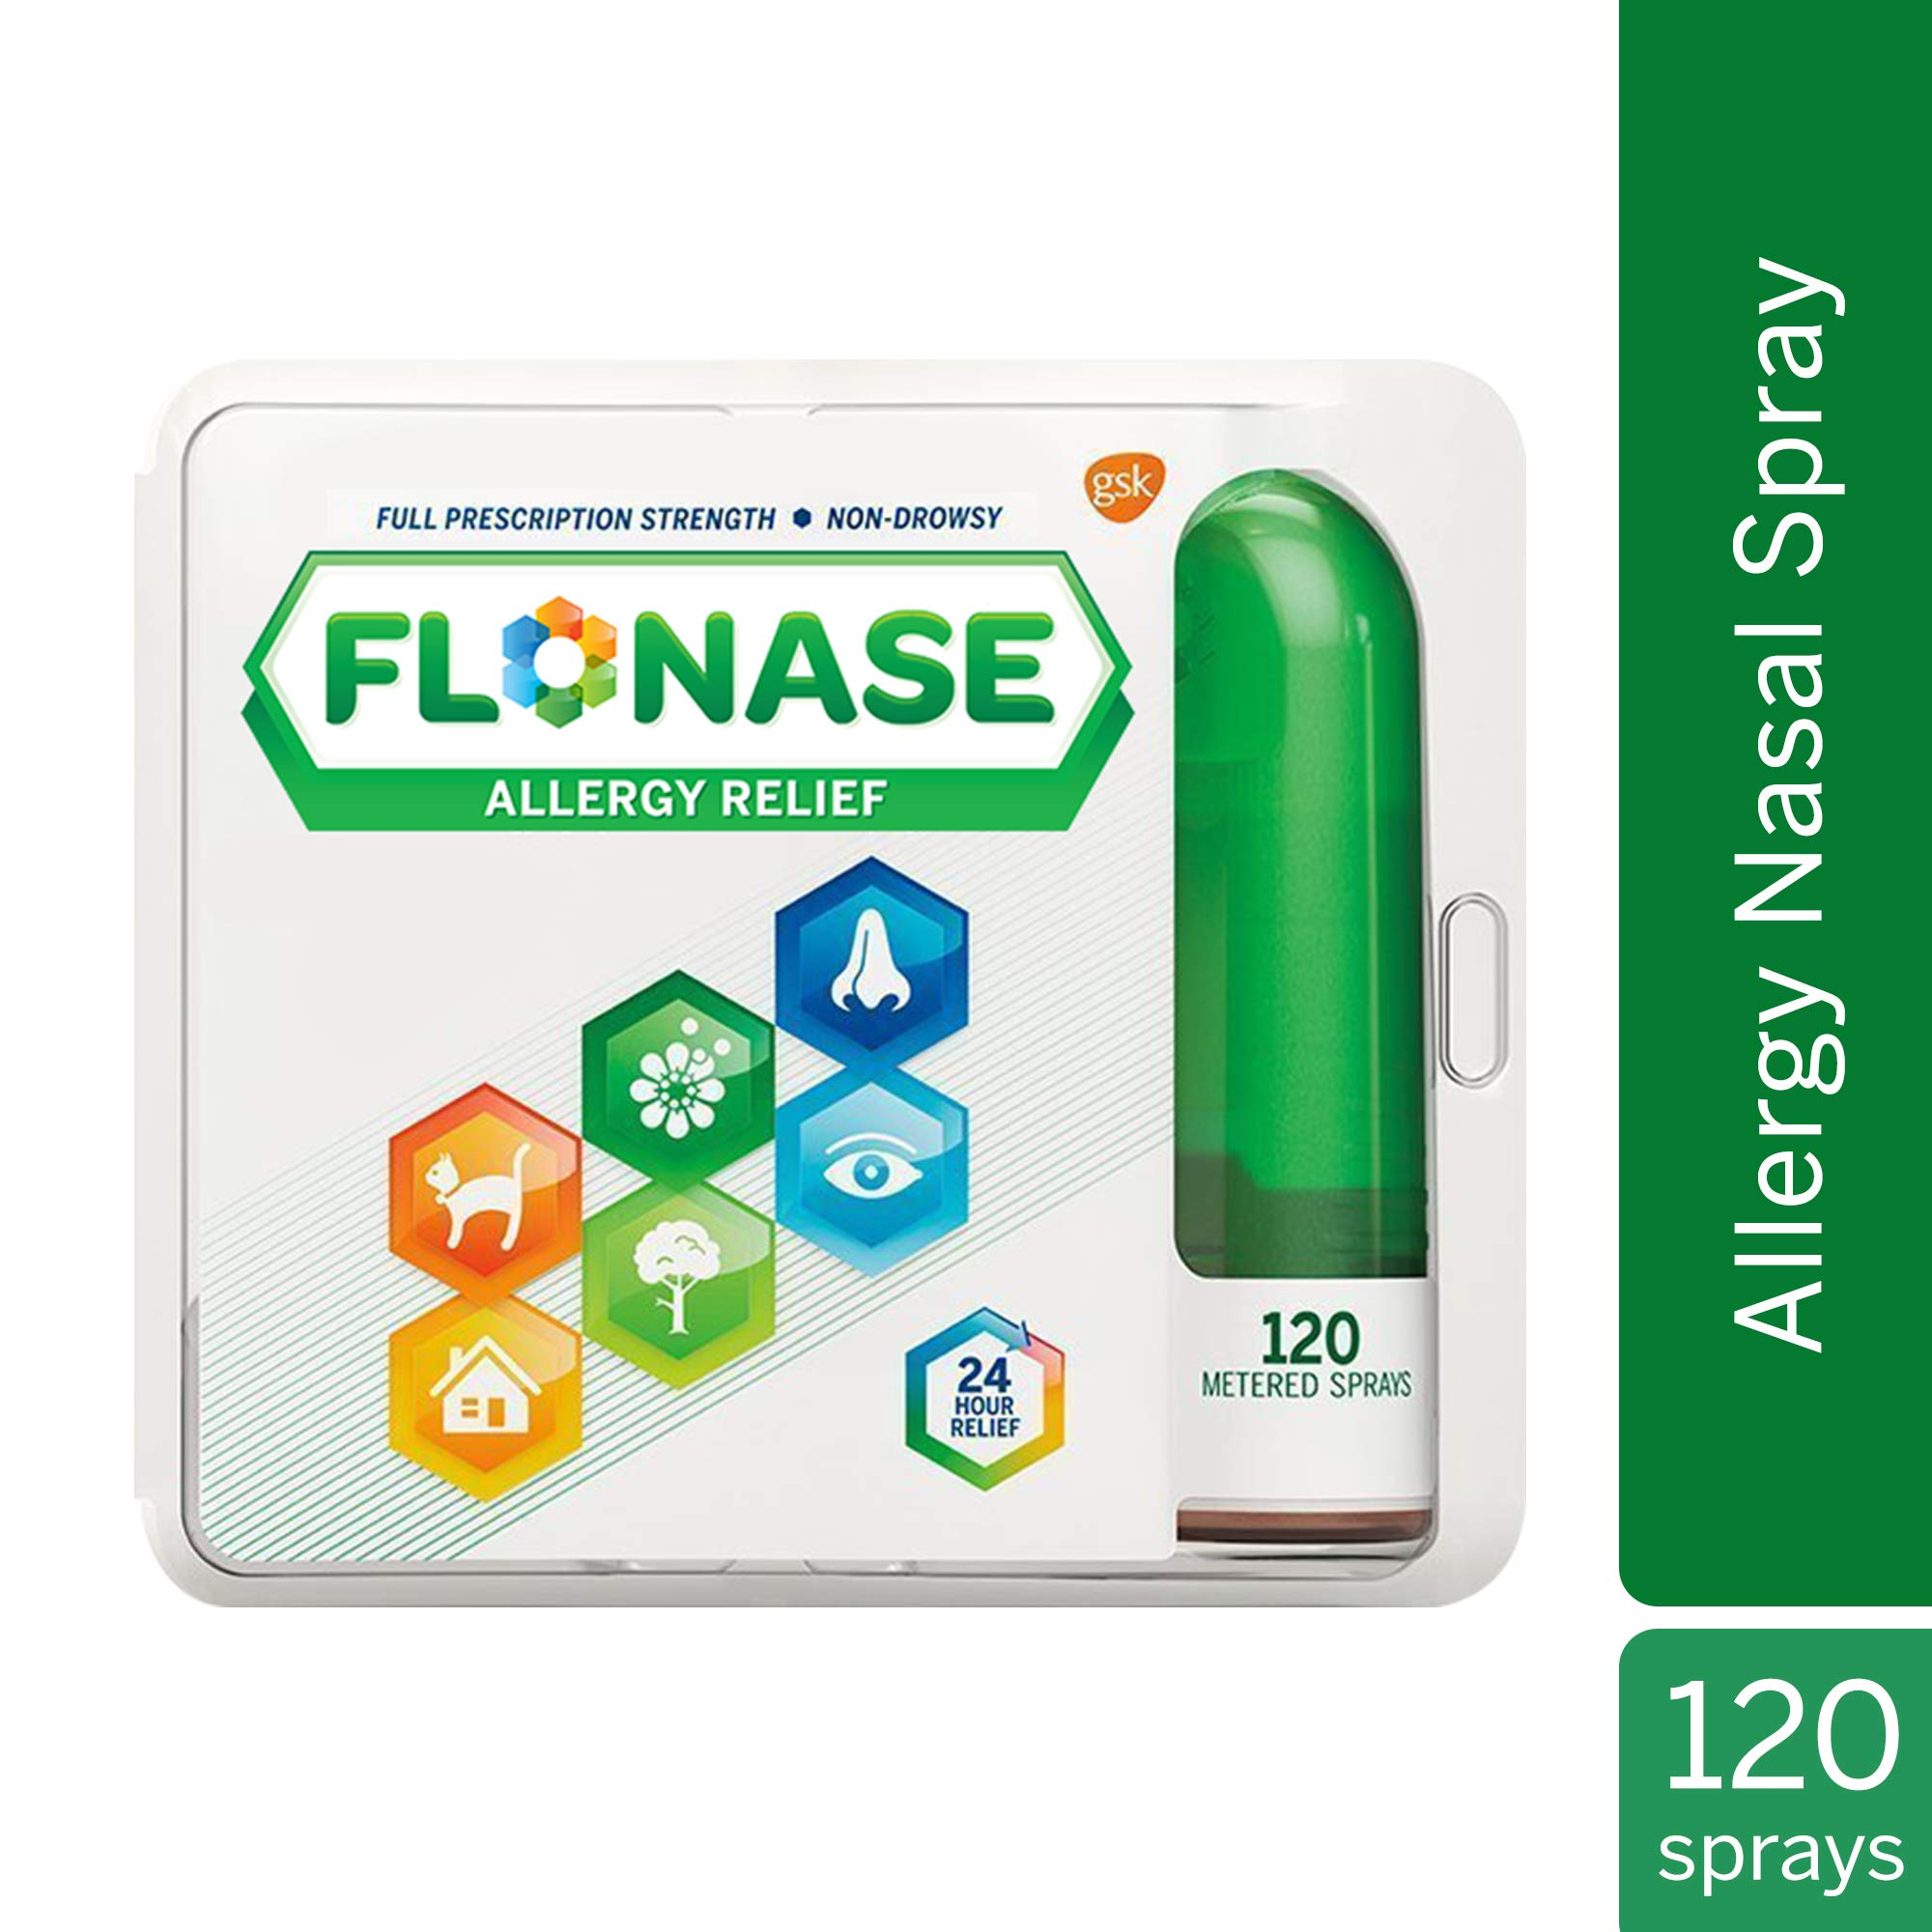 Flonase Nasal Spray for Allergy Relief, 24-Hour Non-Drowsy Allergy Medicine, 120 Sprays by Flonase